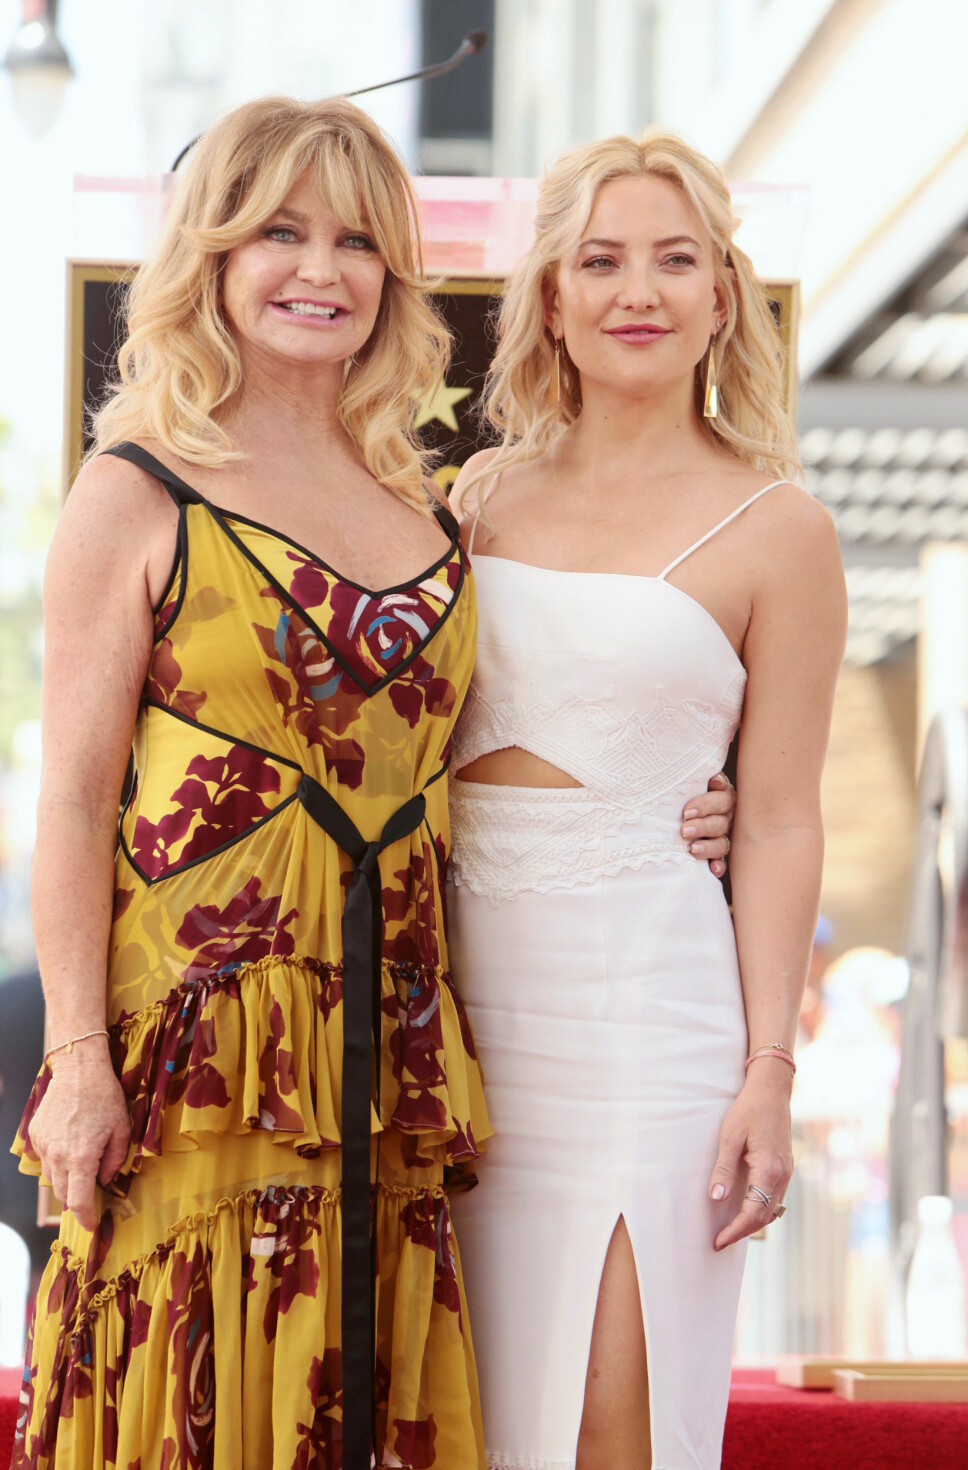 LIKE: Goldie Hawn (73) og datteren Kate Hudson (40) er begge fantastisk vakre.